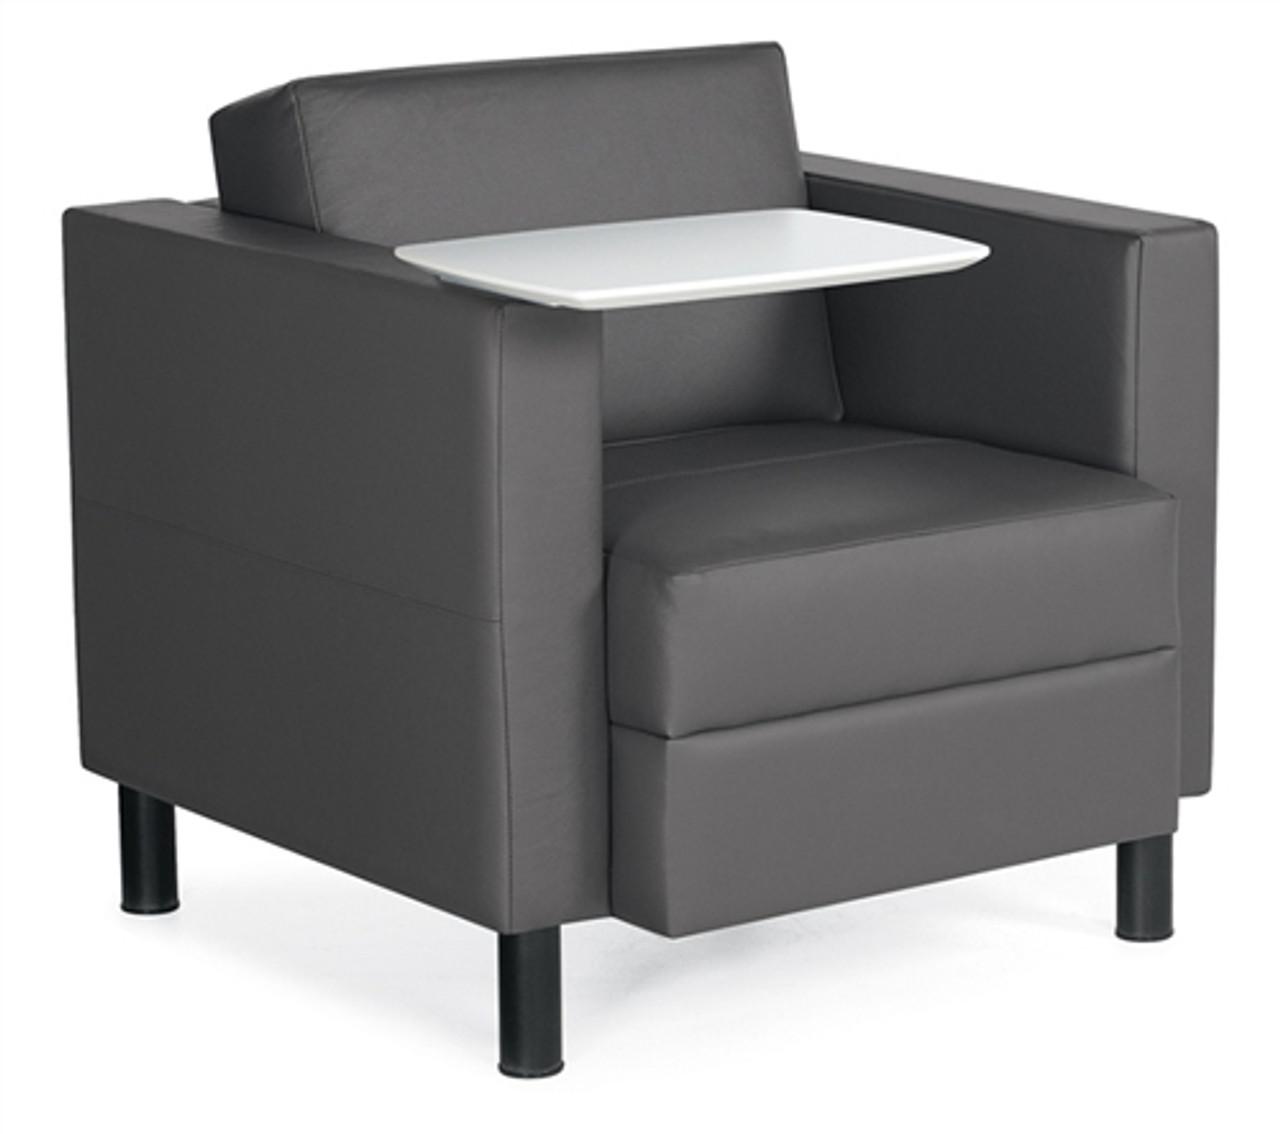 Marvelous Global Citi Series Tablet Arm Leather Lounge Chair 7875Lfltl Inzonedesignstudio Interior Chair Design Inzonedesignstudiocom